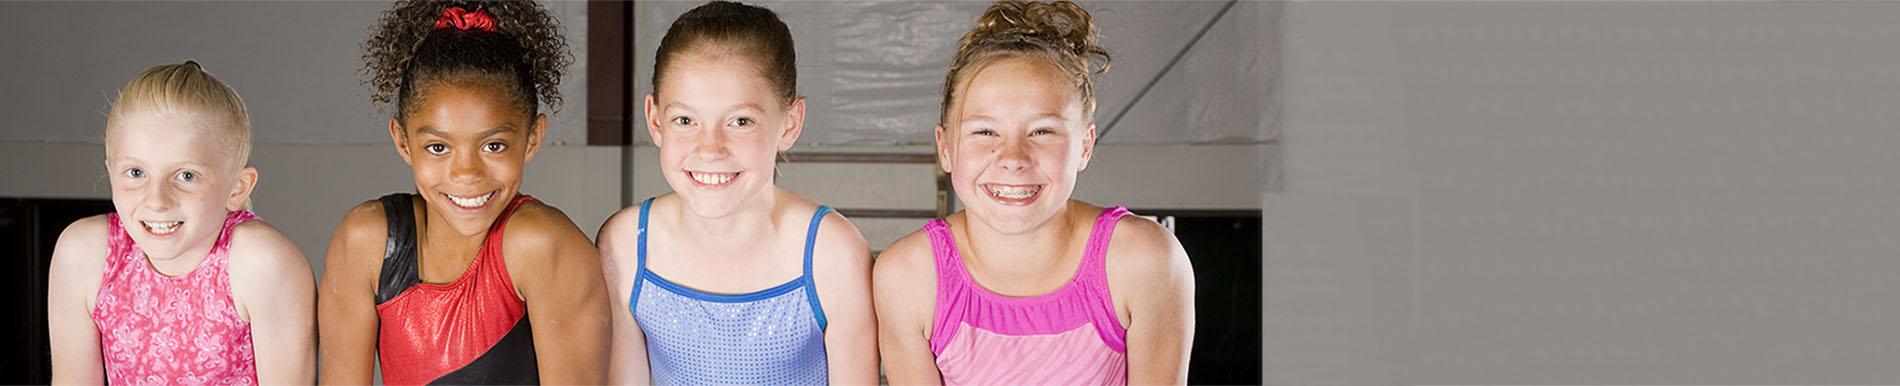 https://www.healthychildren.org/SiteCollectionImage-Homepage-Banners/gimnastas-bigbanner.jpg